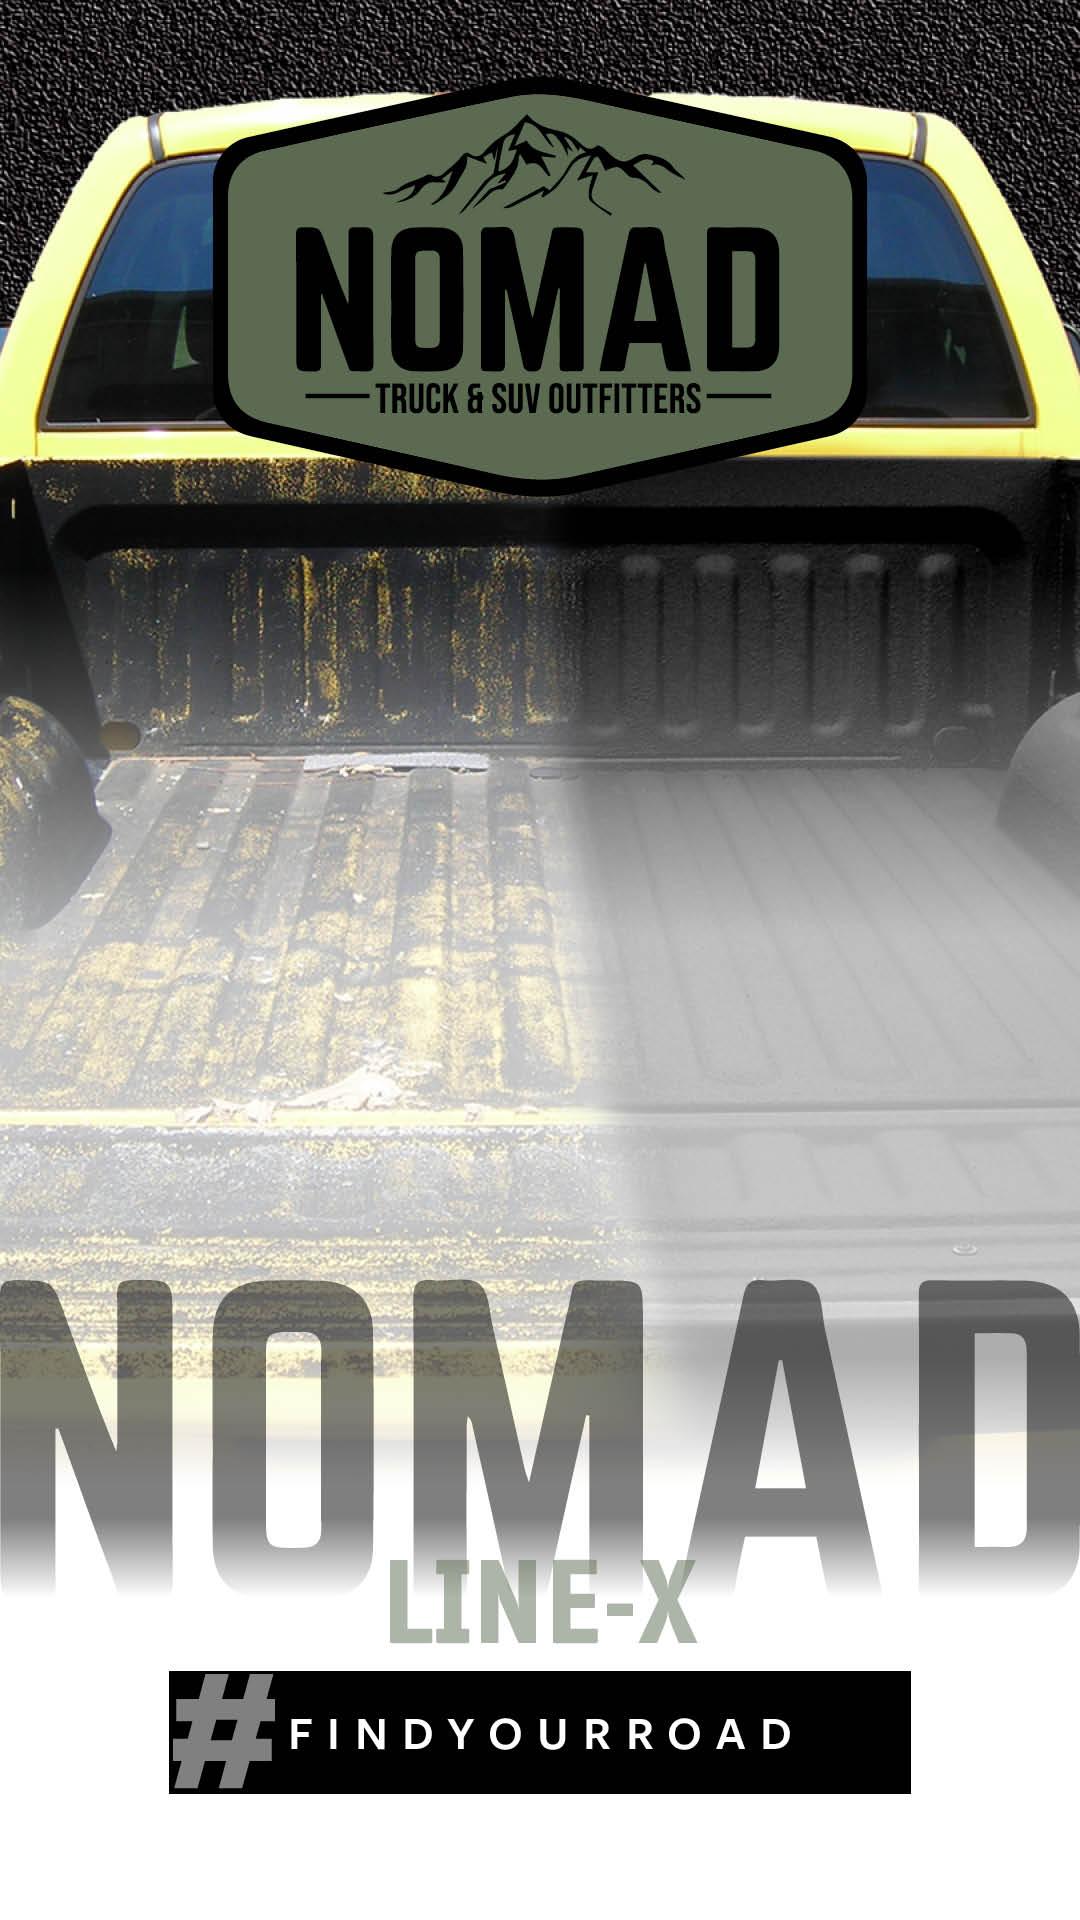 NOMAD_LINEX2